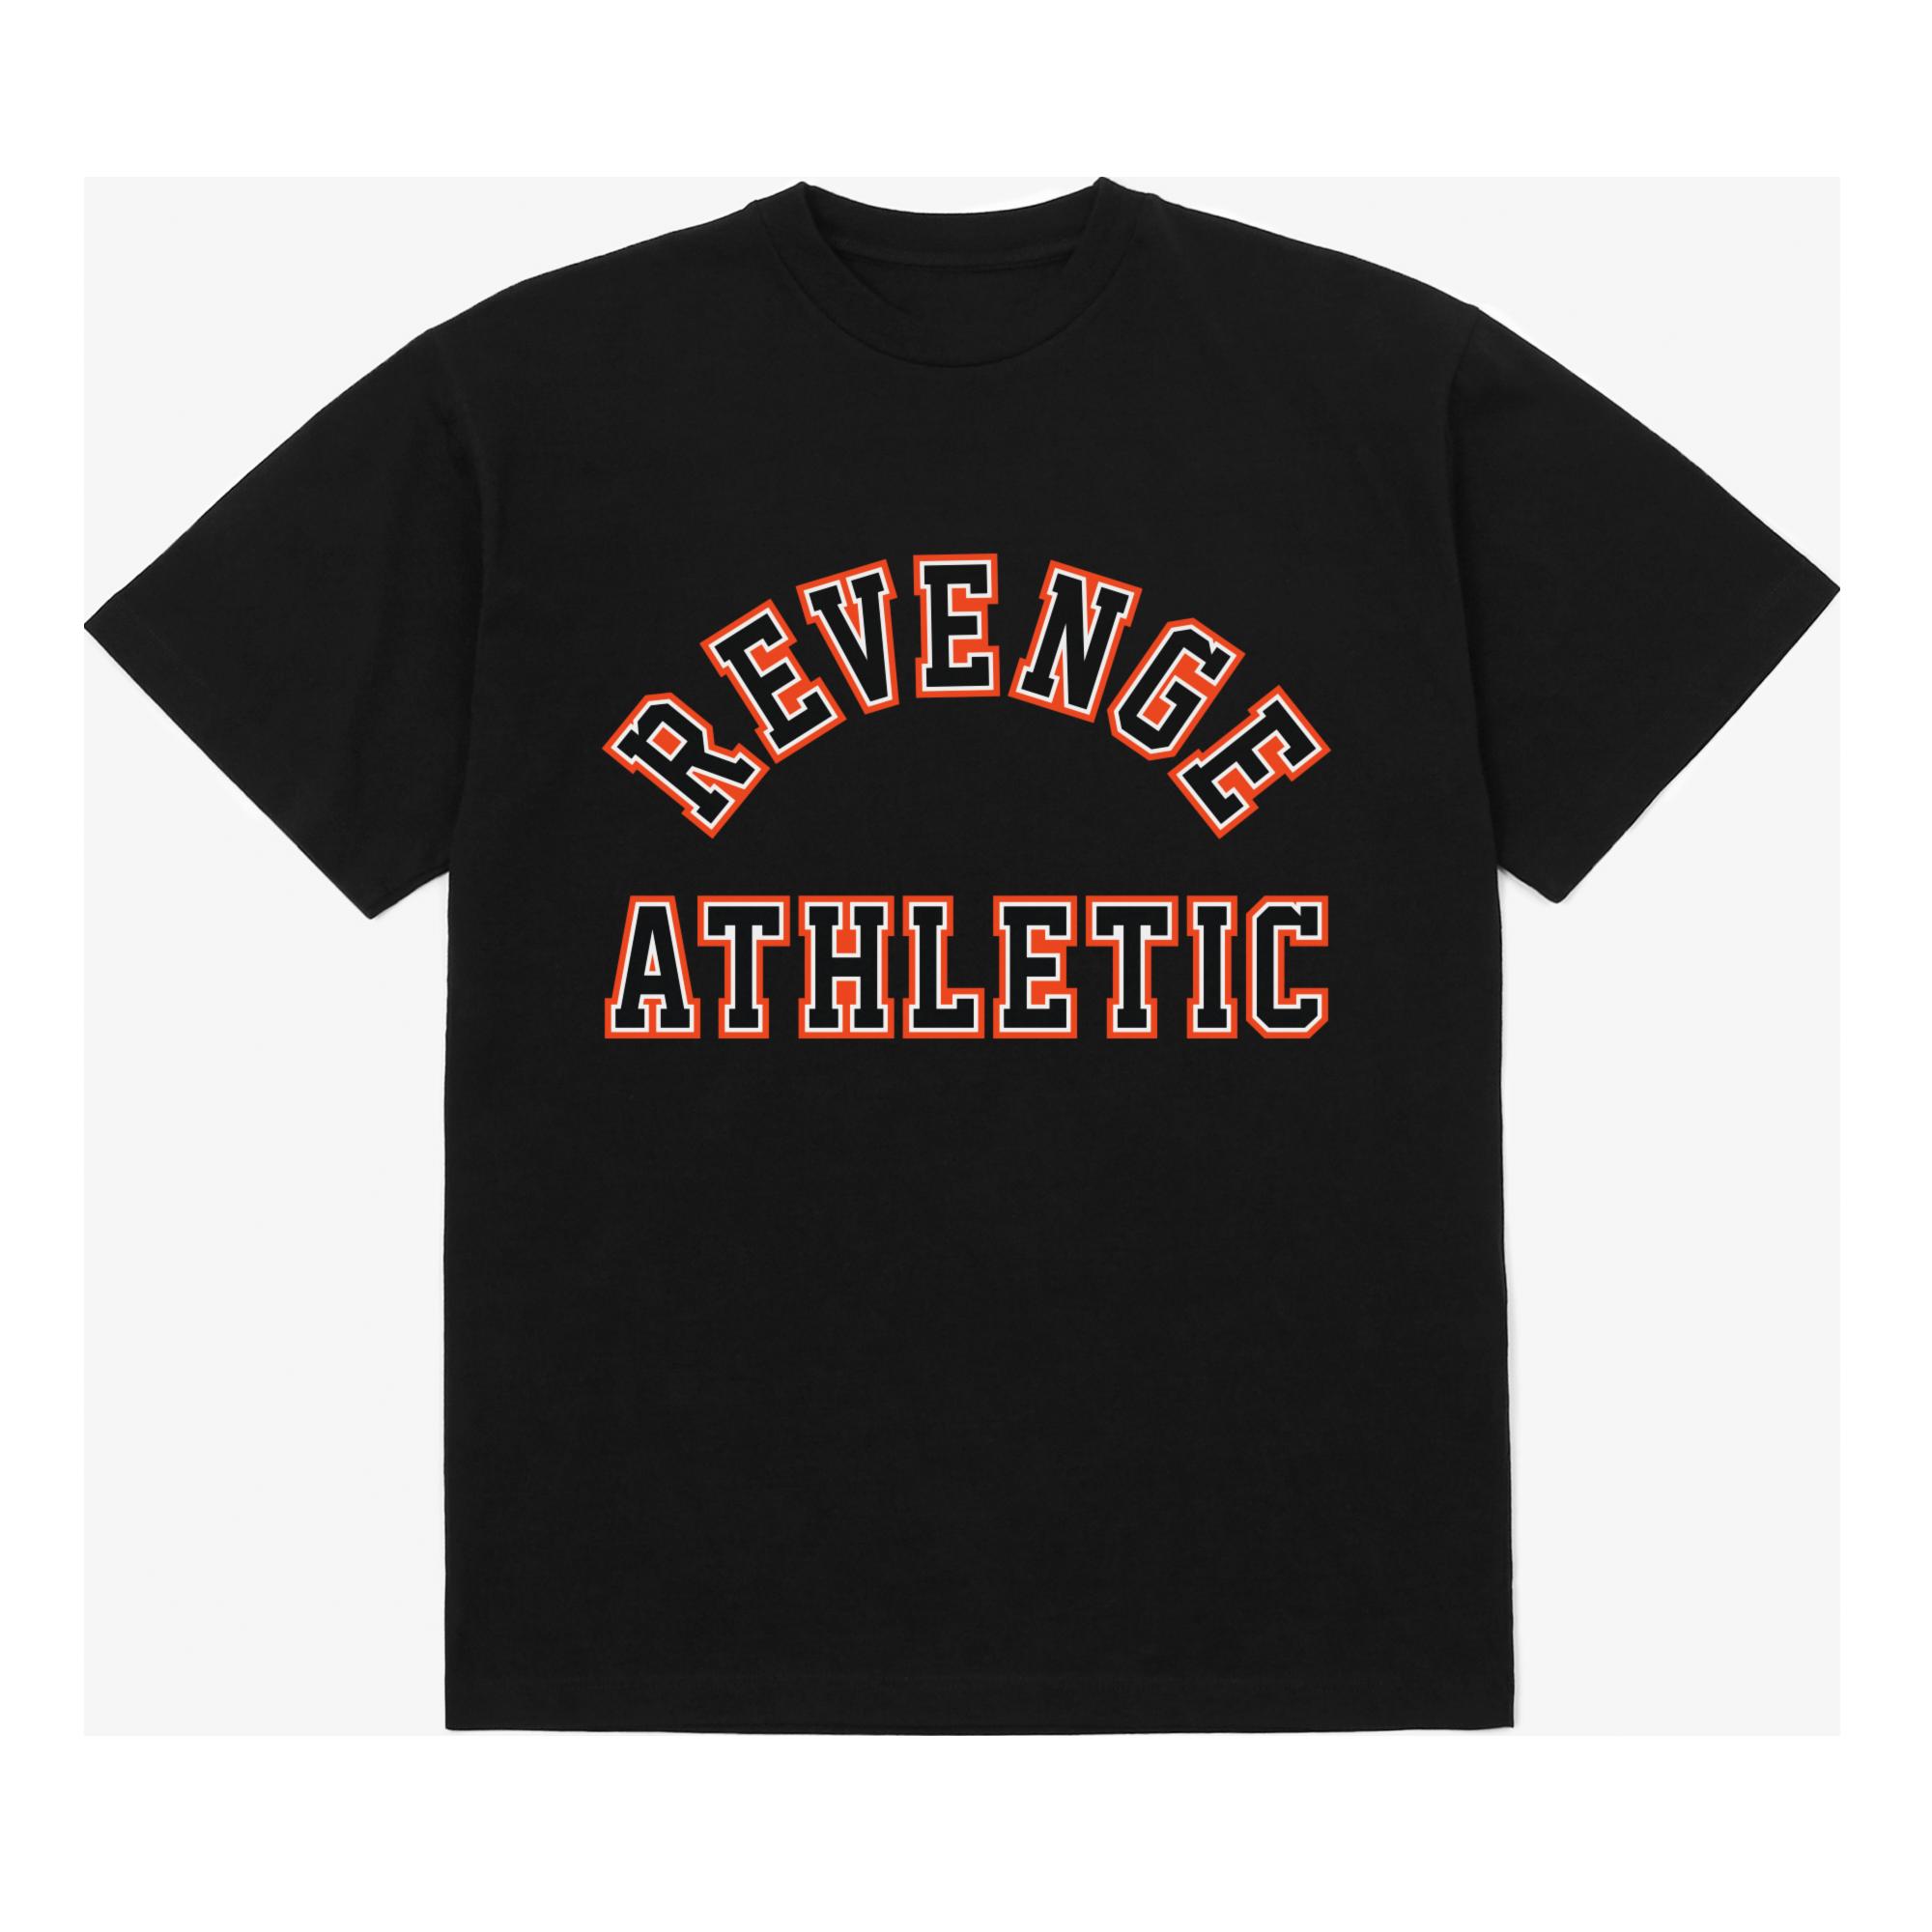 Revenge Athletic Collegiate T-Shirt - Black